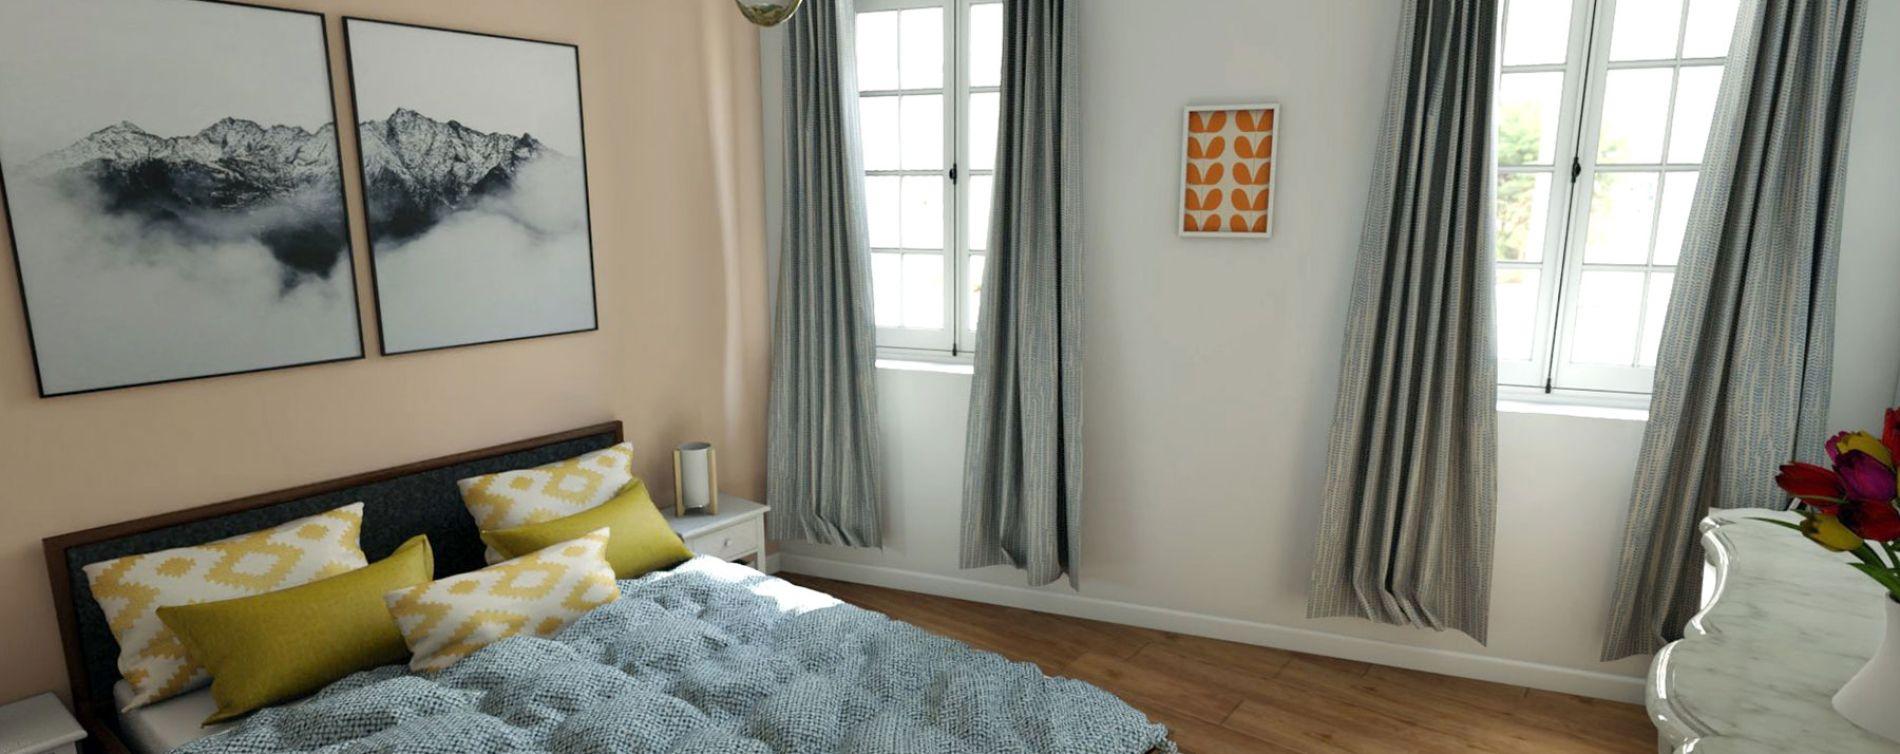 Angoulême : programme immobilier neuve « Villa Equalisma » (4)